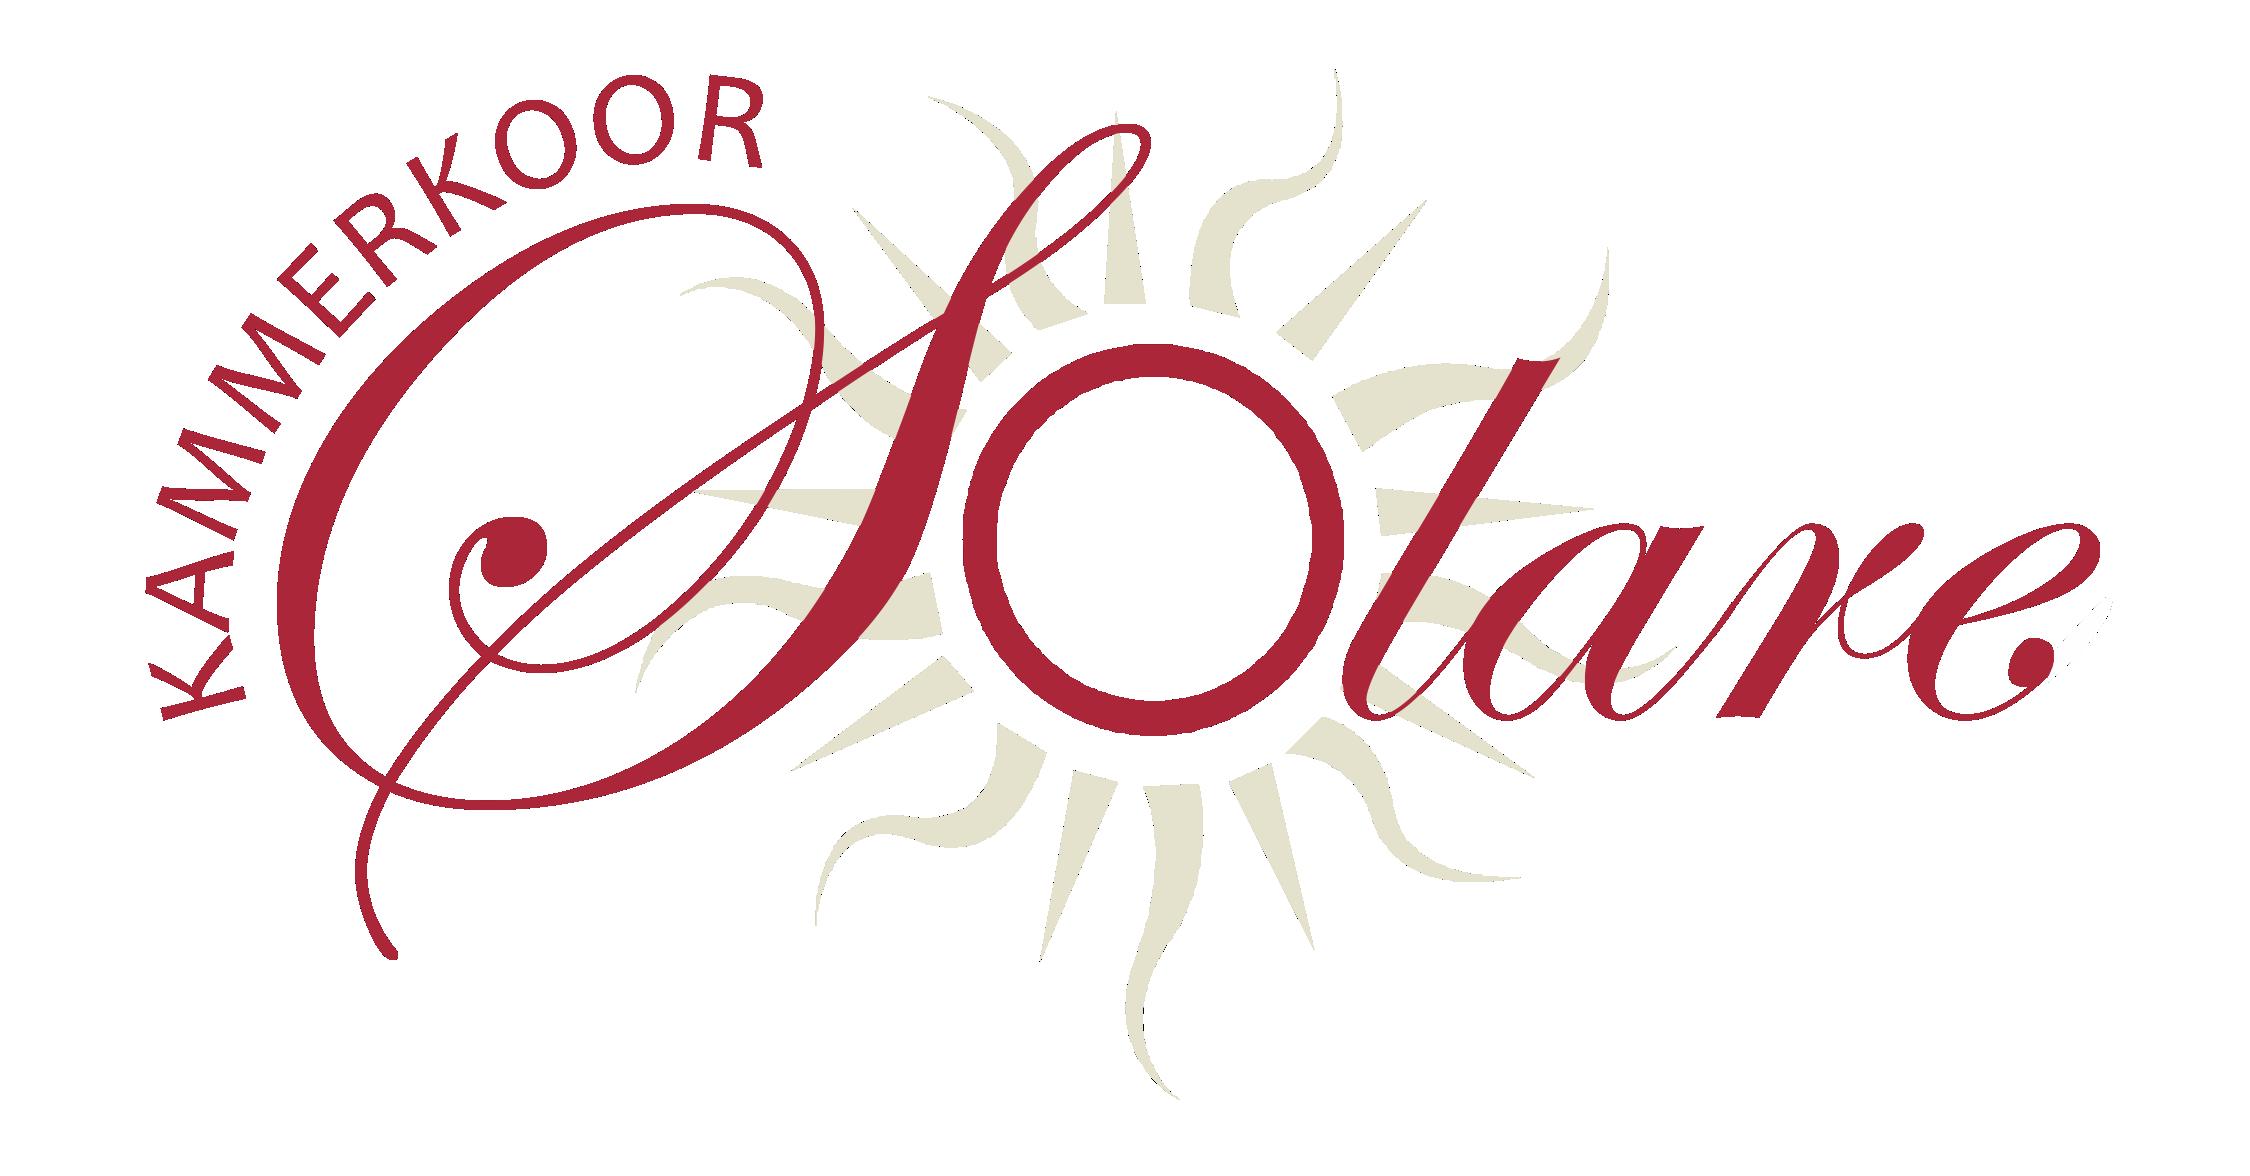 Kammerkoor Solare